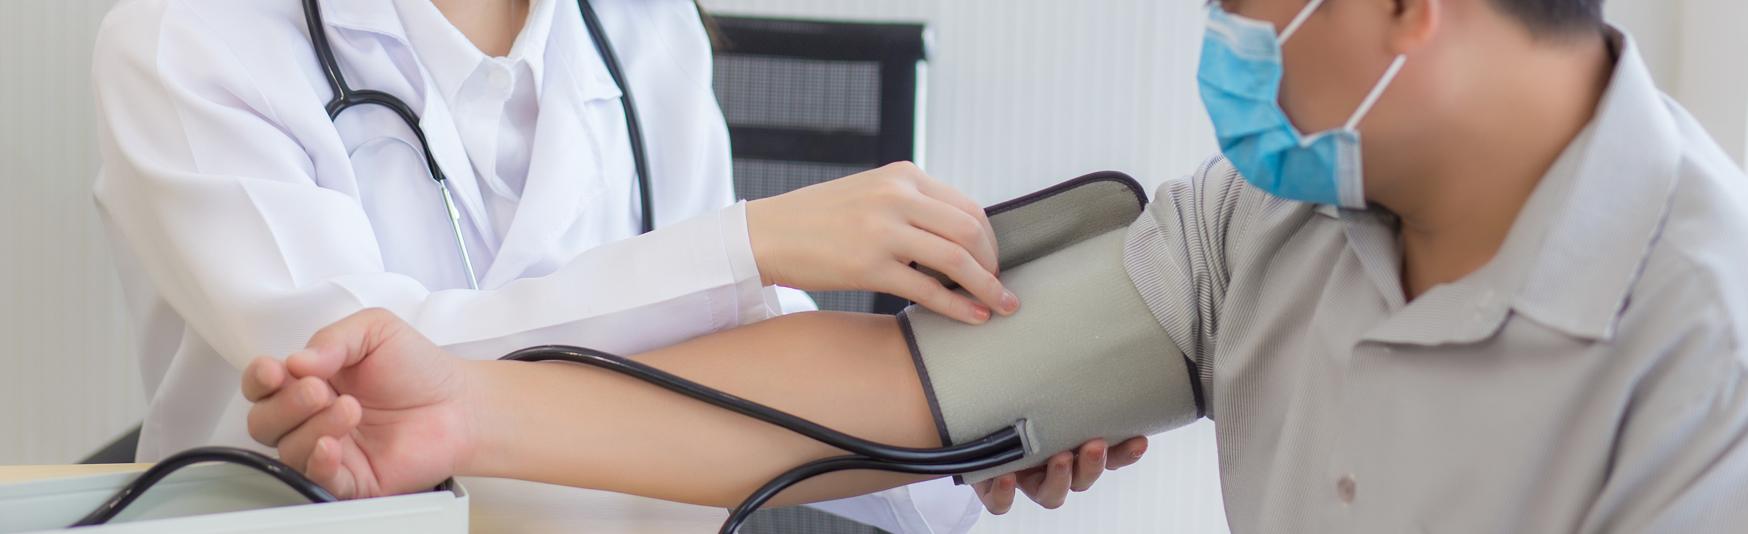 LP_Header-1748x534-asian-woman-doctor-blood-pressure-diabetes-asian-male-patient-masks